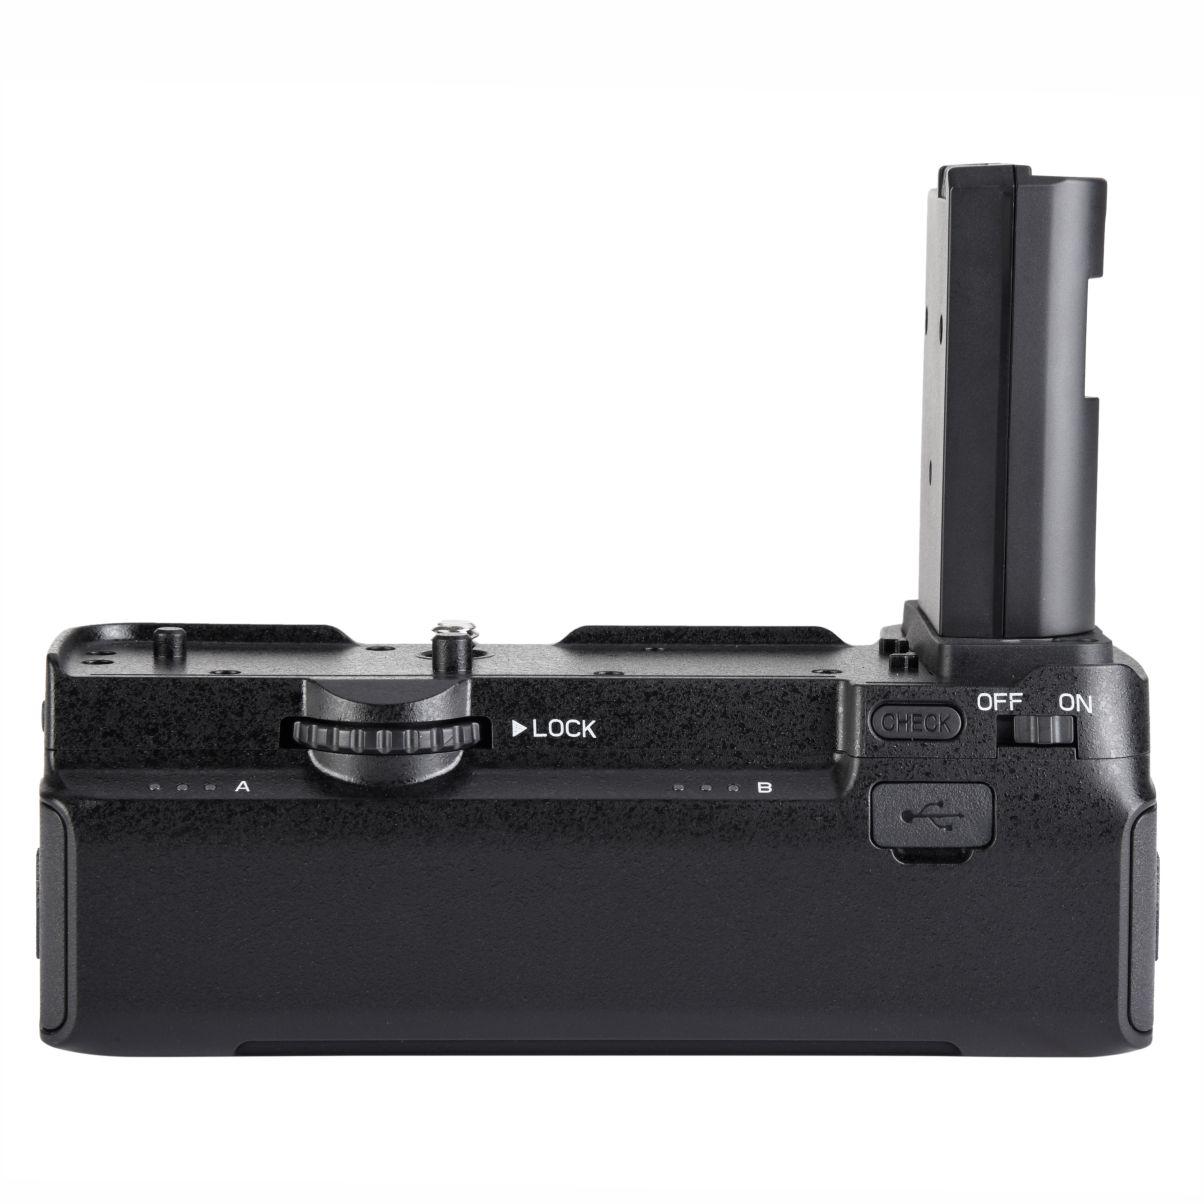 Kit Grip MB-N10RC + 2 Baterias EN-EL15 + Carregador Para Nikon Z6/Z7